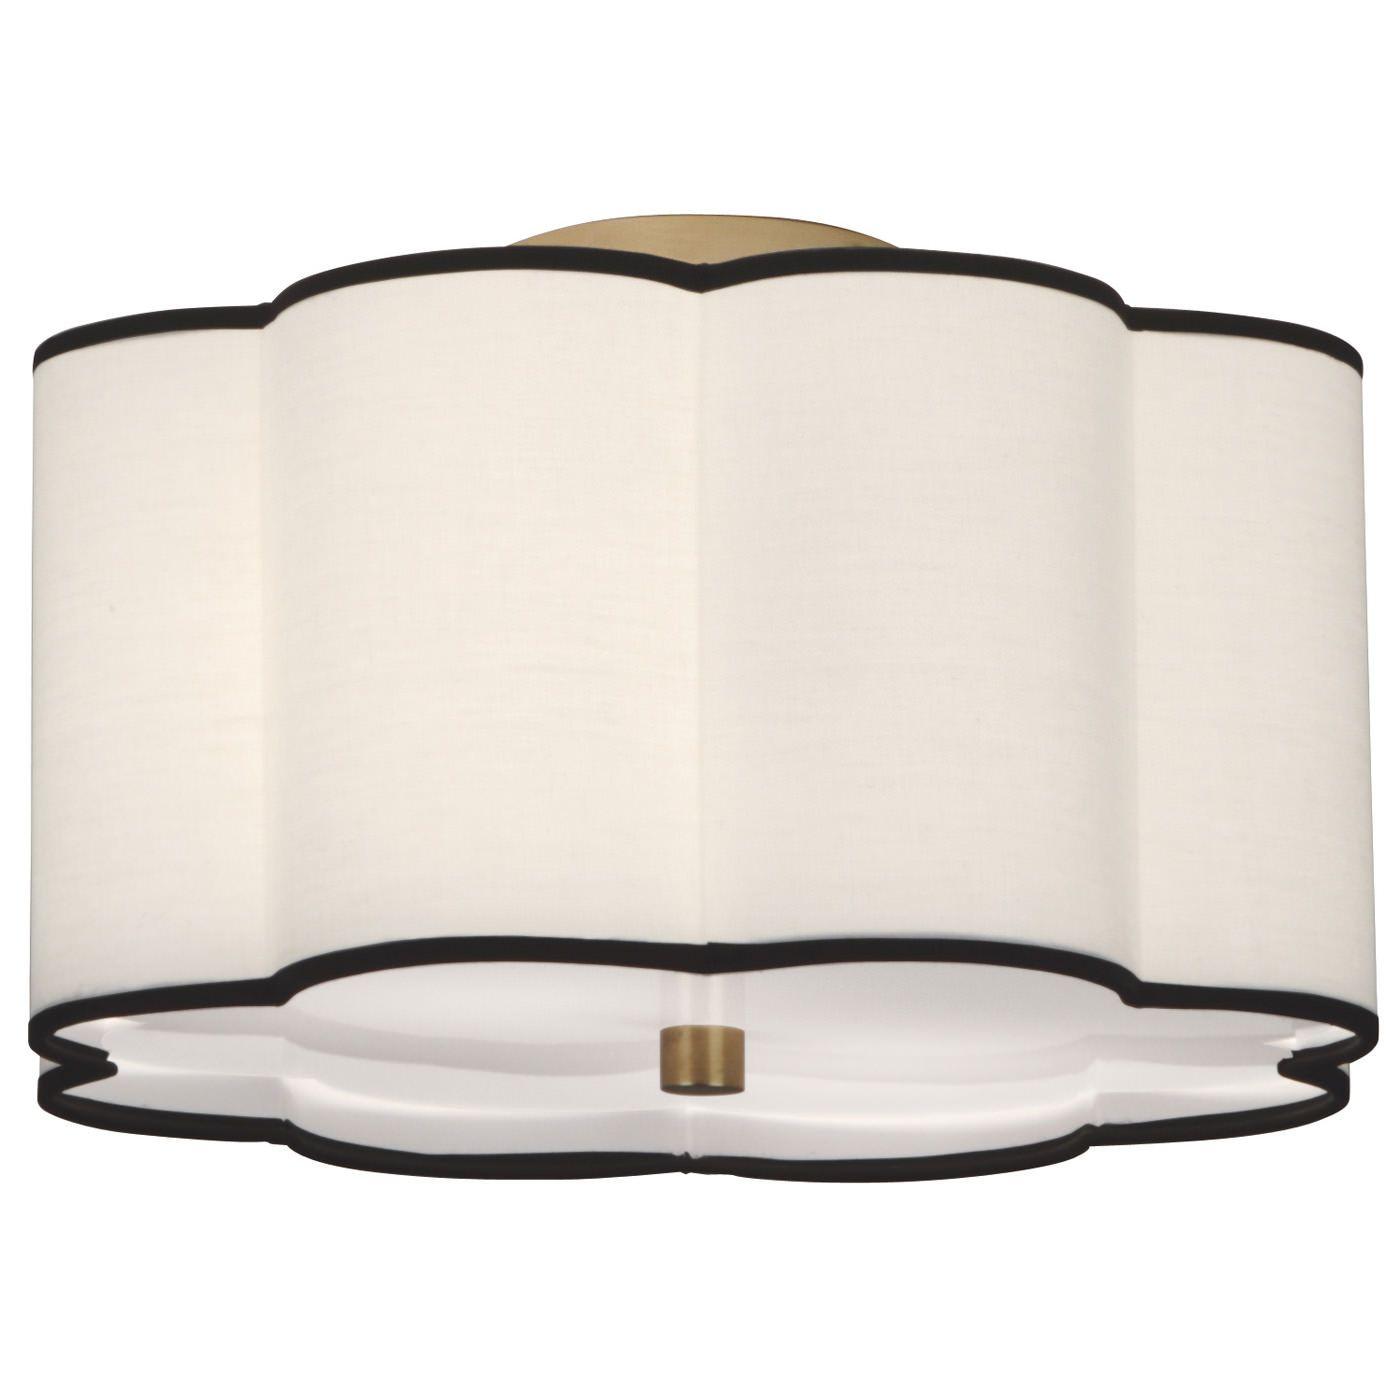 295 dimensions 16u2033 diameter 975u2033 h ceiling lamps axis semi flush mount